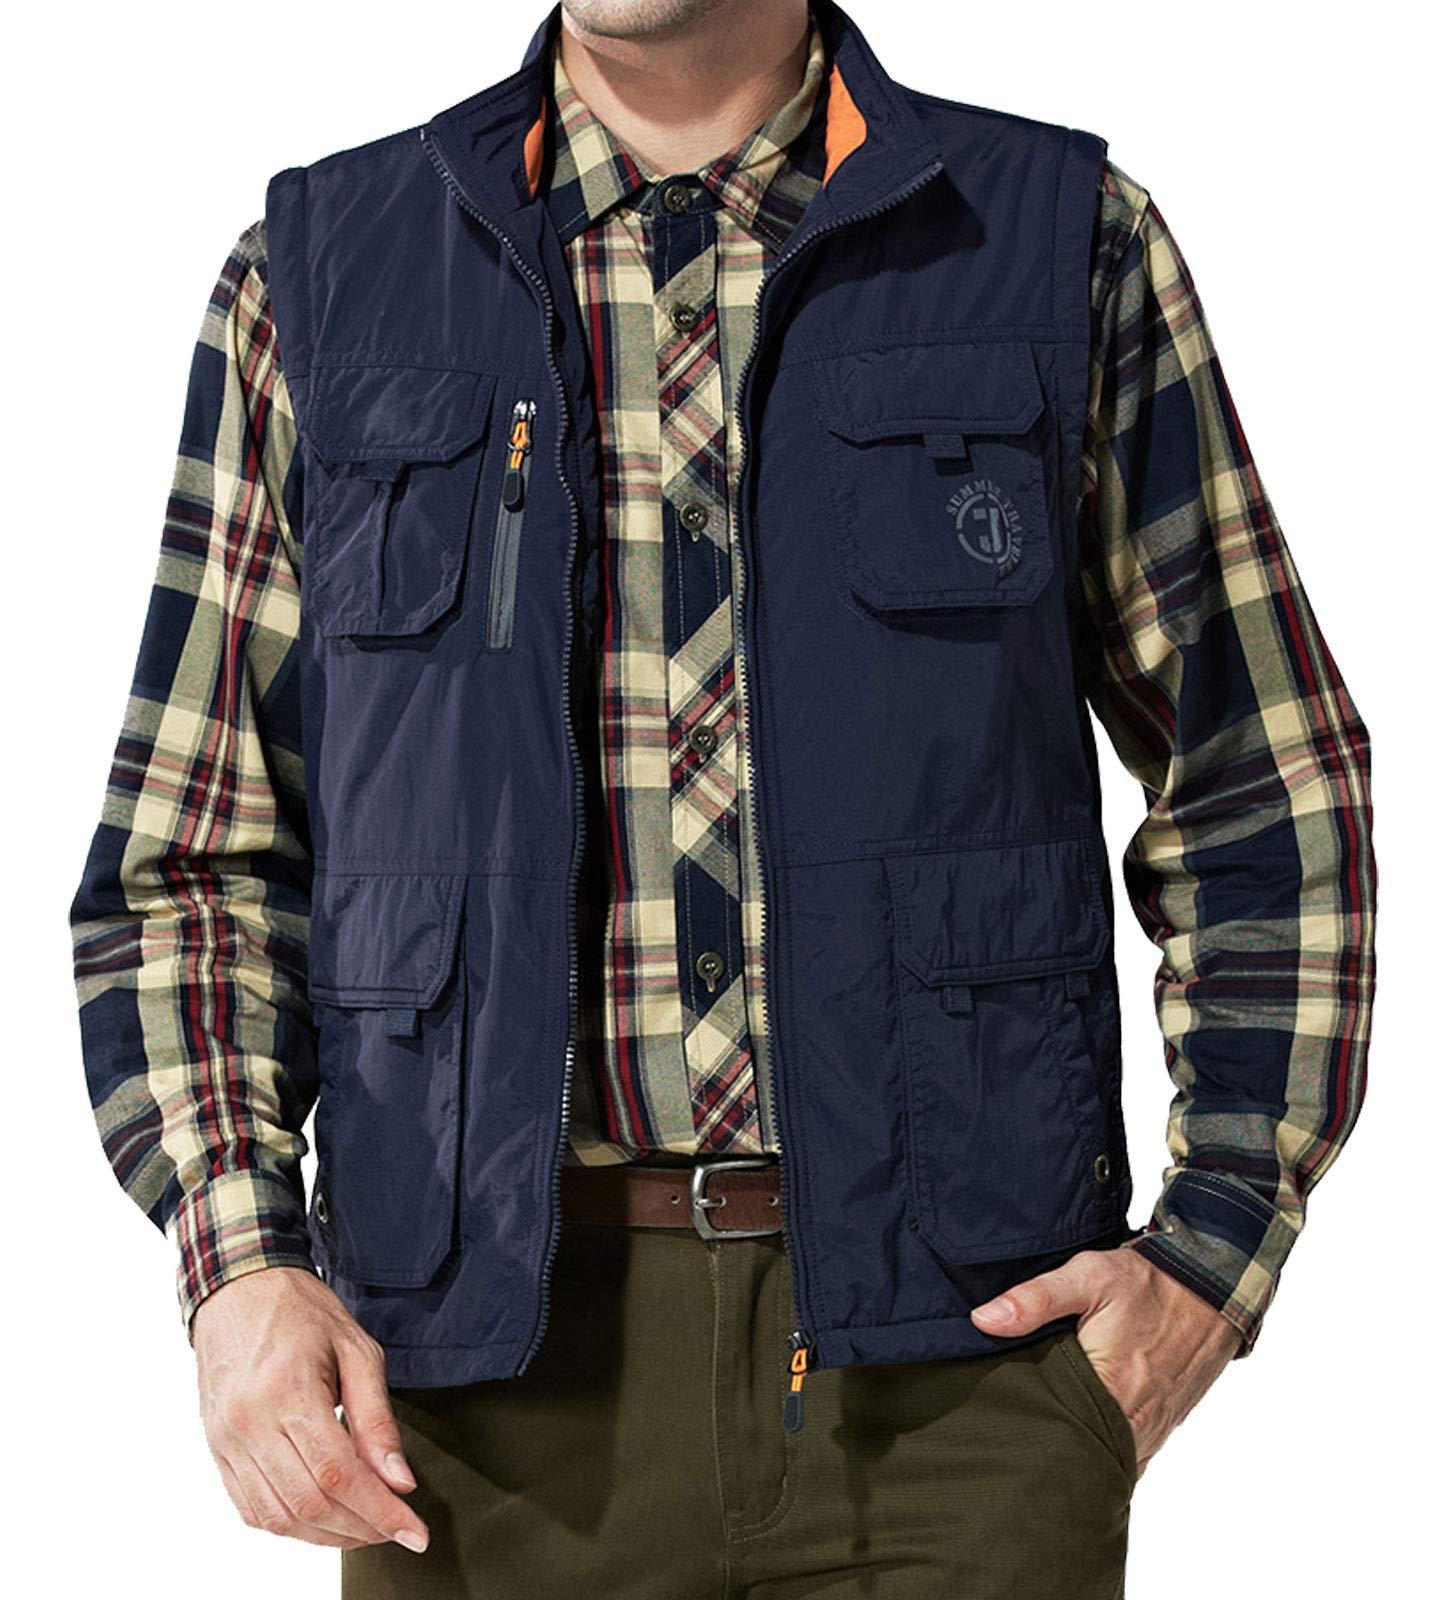 Flygo Men's Casual Lightweight Outdoor Travel Fishing Vest Jacket Multi Pockets (X-Large, Fleece Lined Navy) by Flygo